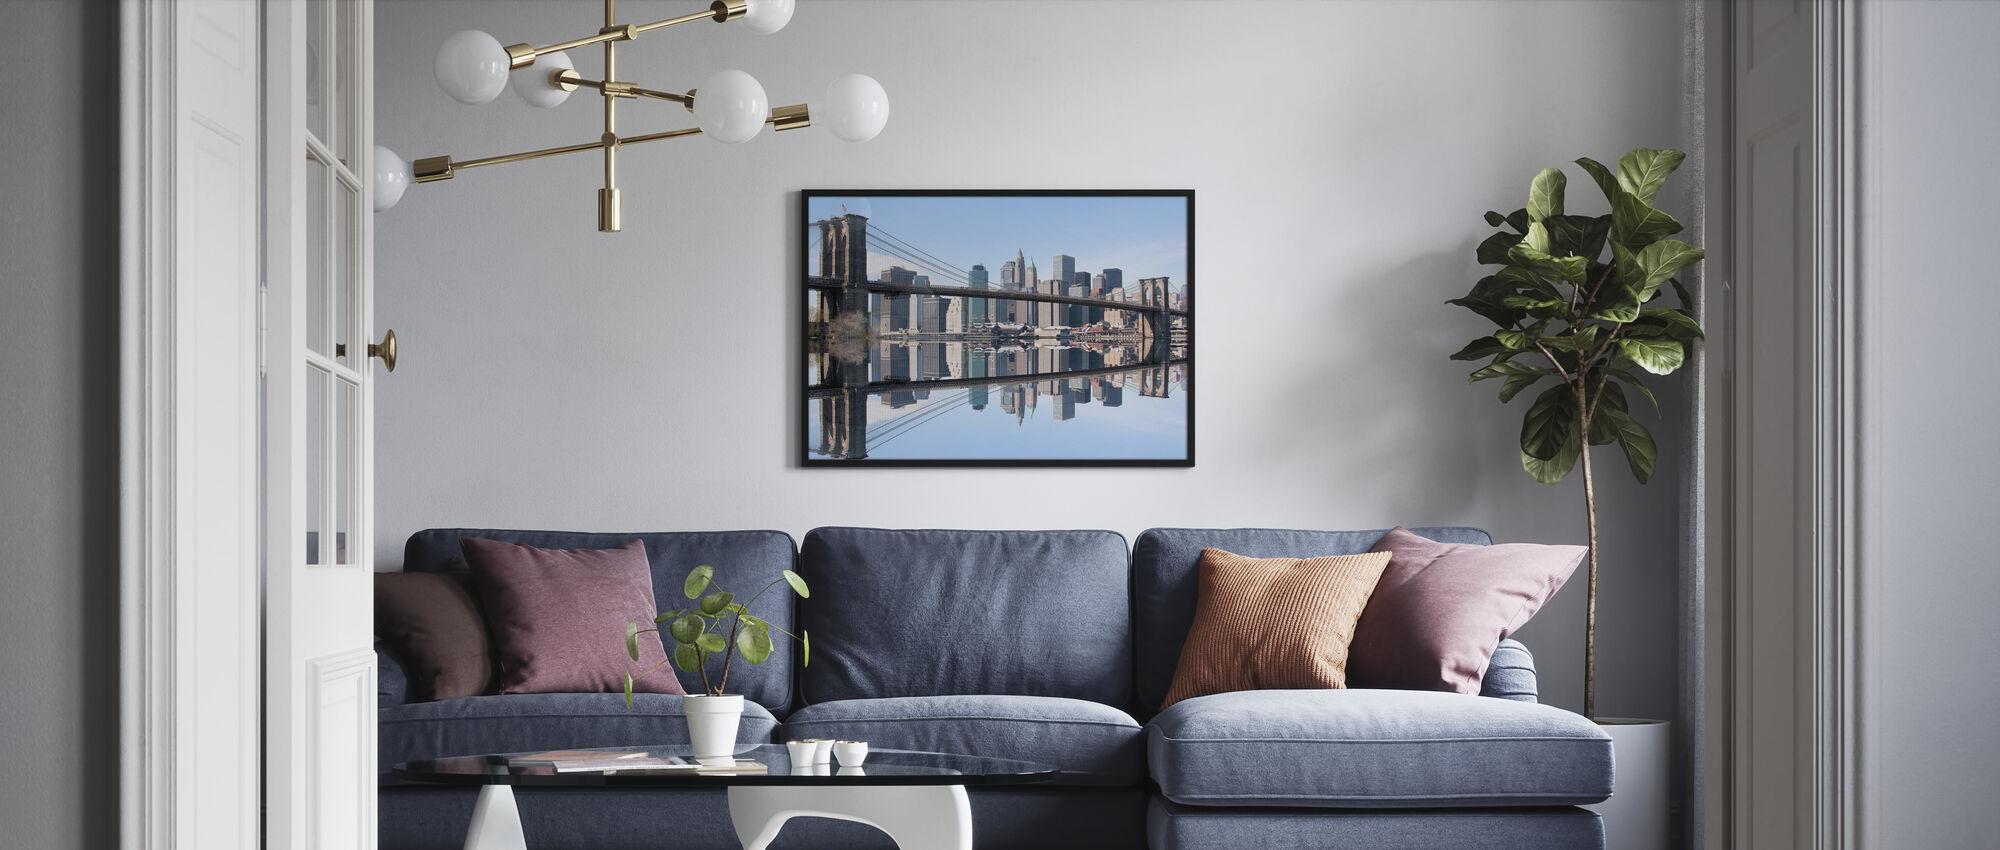 Brooklyn Bridge klart blå dag - Plakat - Stue